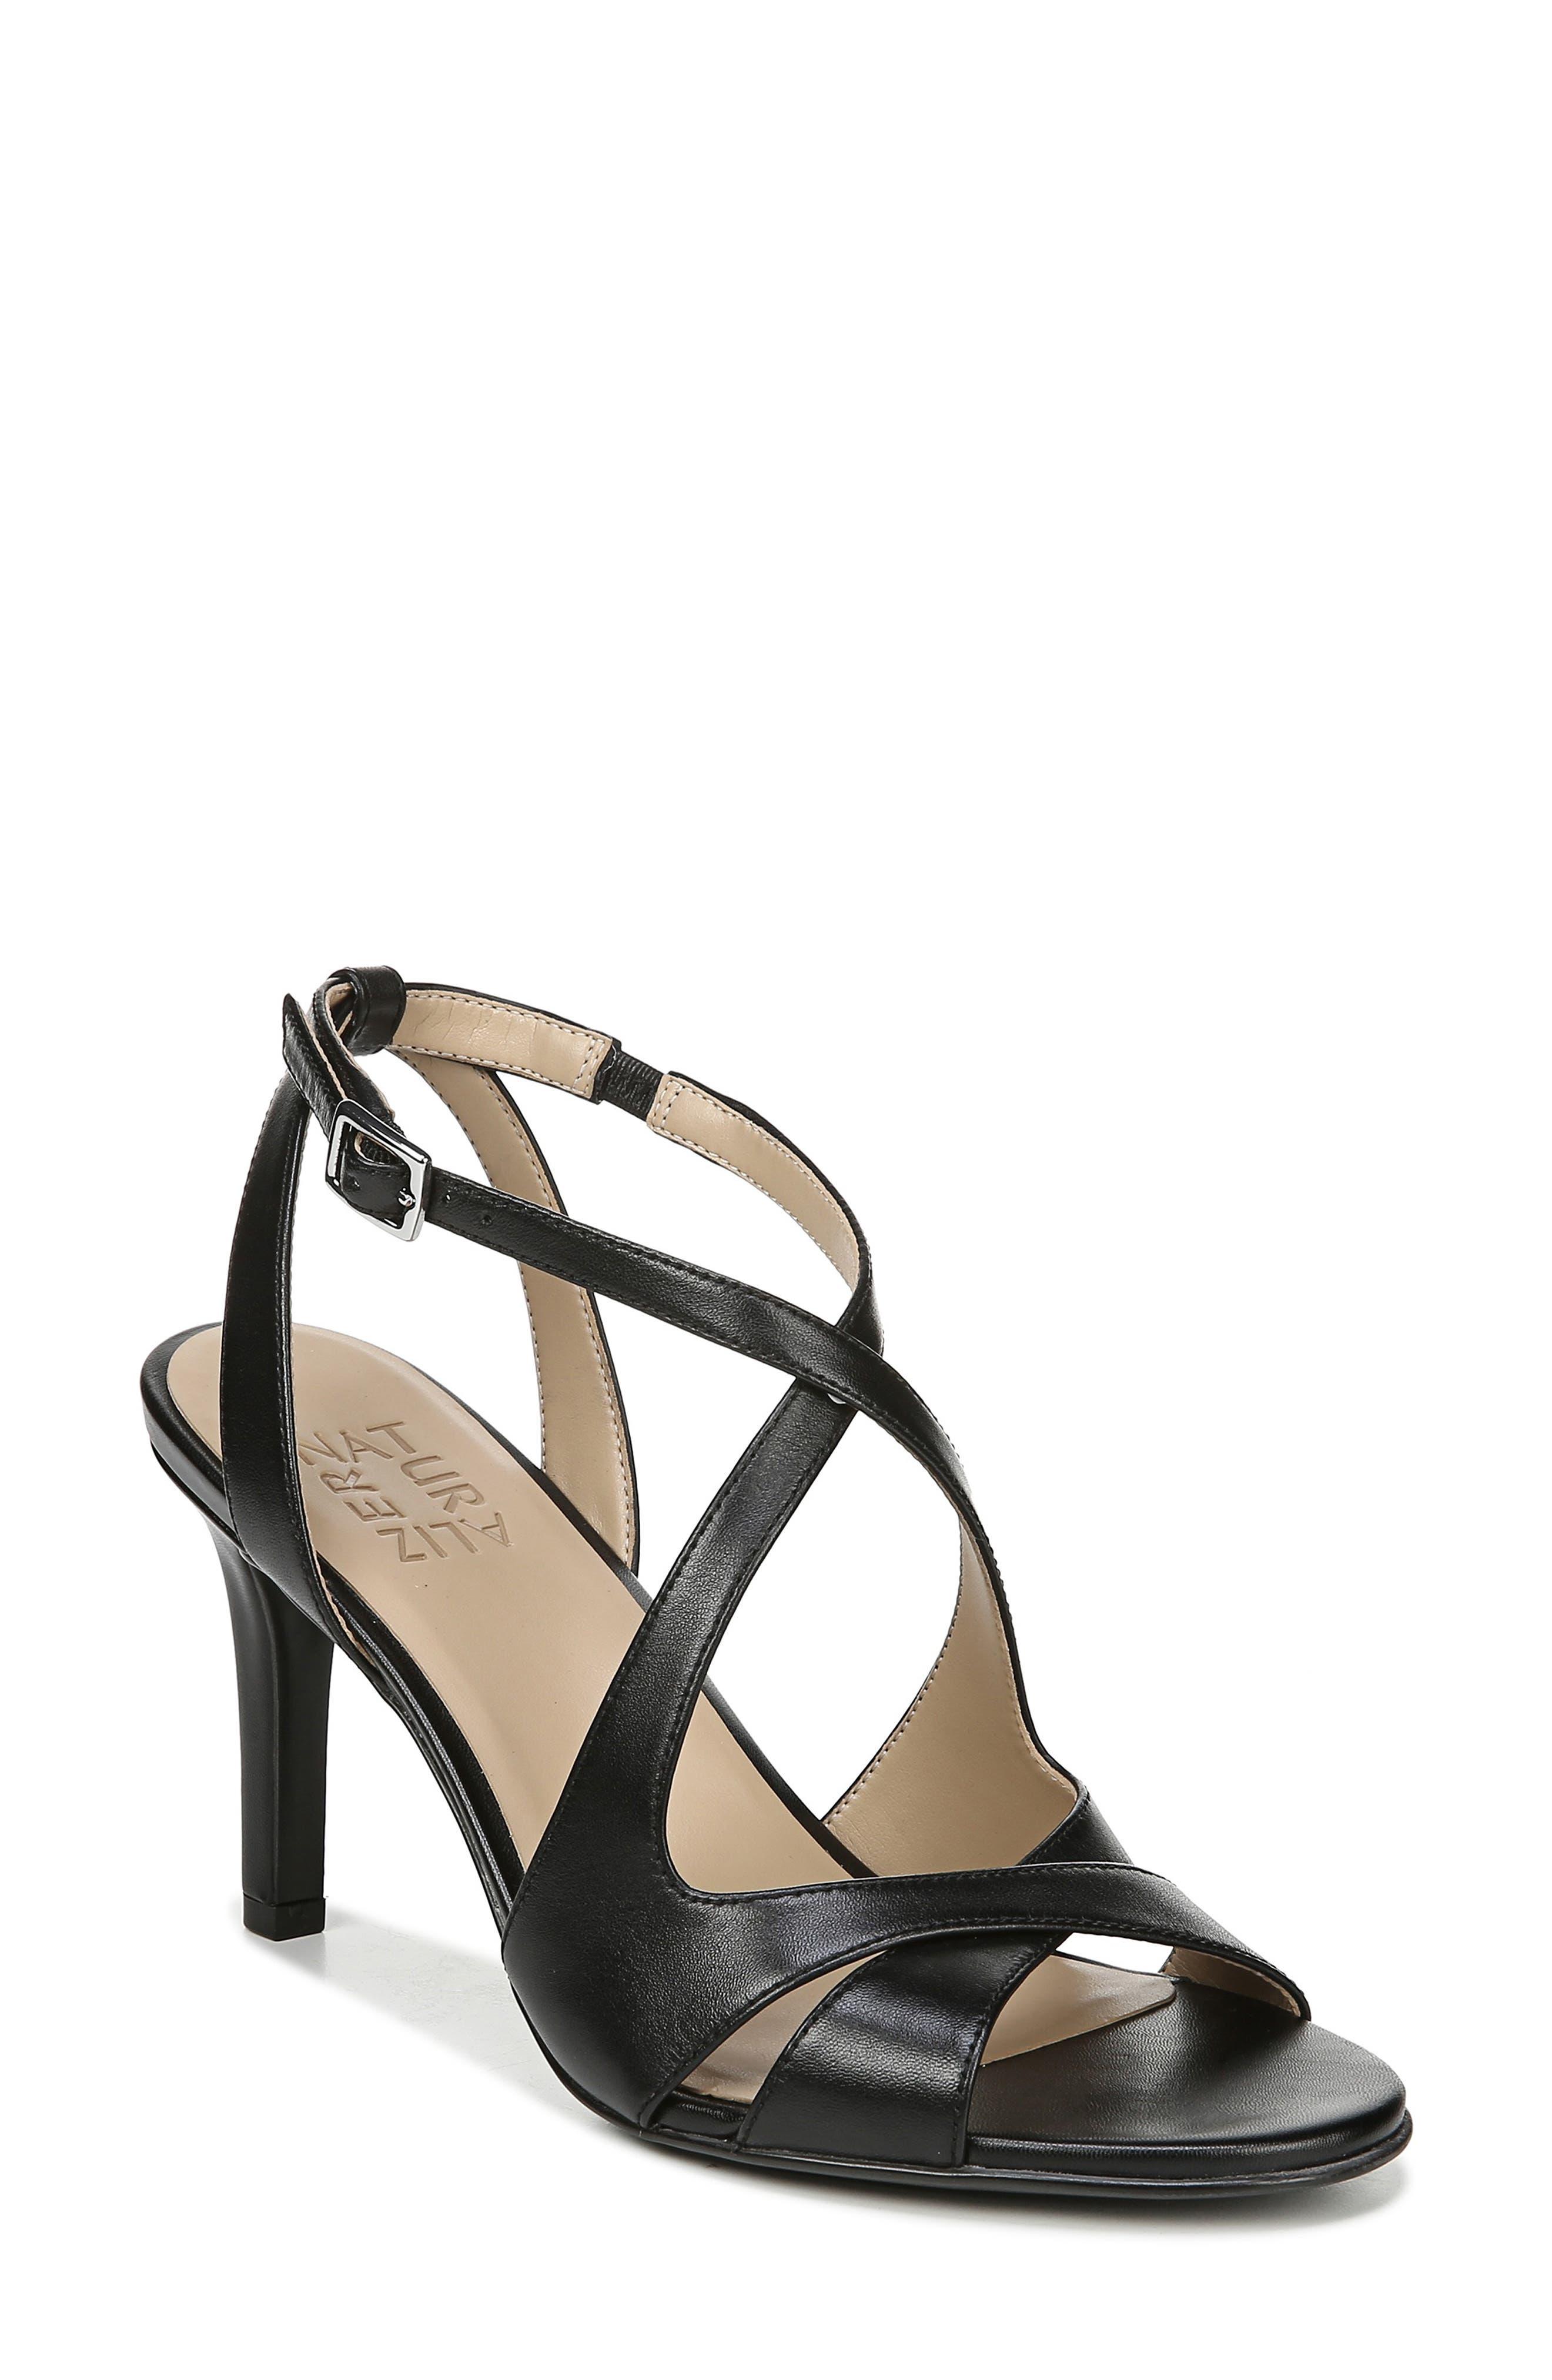 NATURALIZER Klein Strappy Sandal, Main, color, BLACK LEATHER